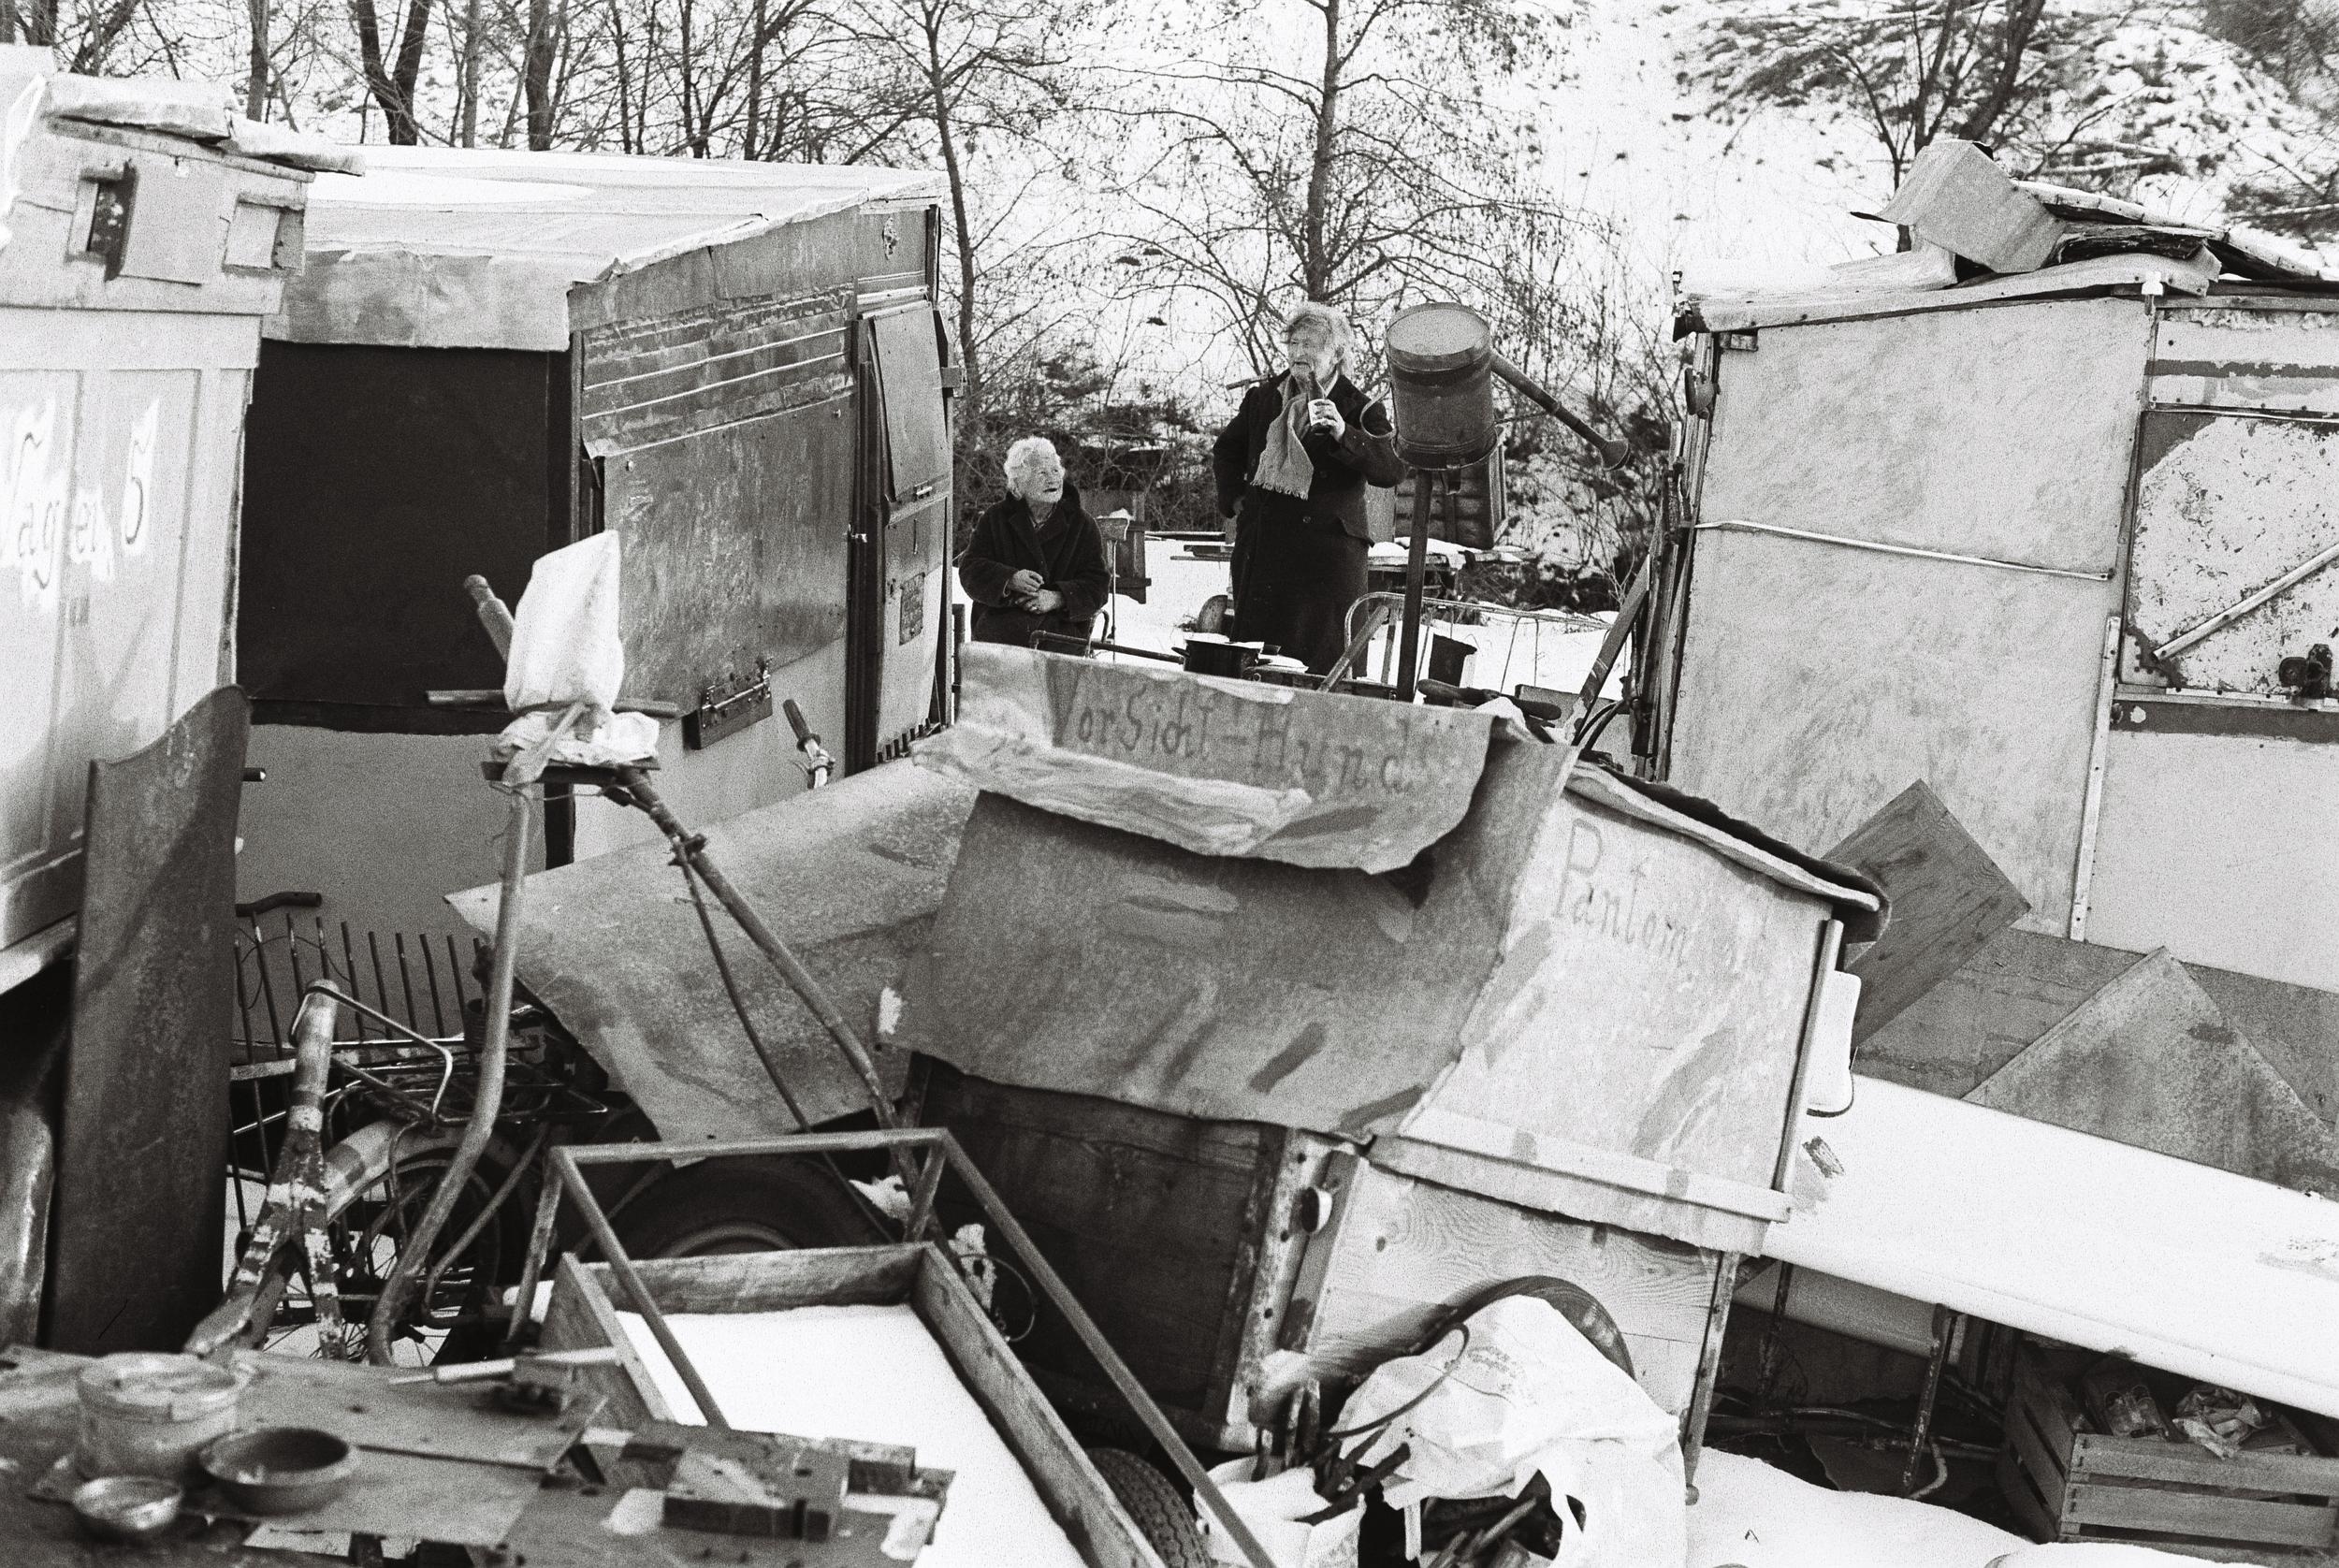 Camera: Pentax Spotmatic 135mm | Film: Ilford FP4 developed in Rodinal Allgäu, Bavaria in 1973